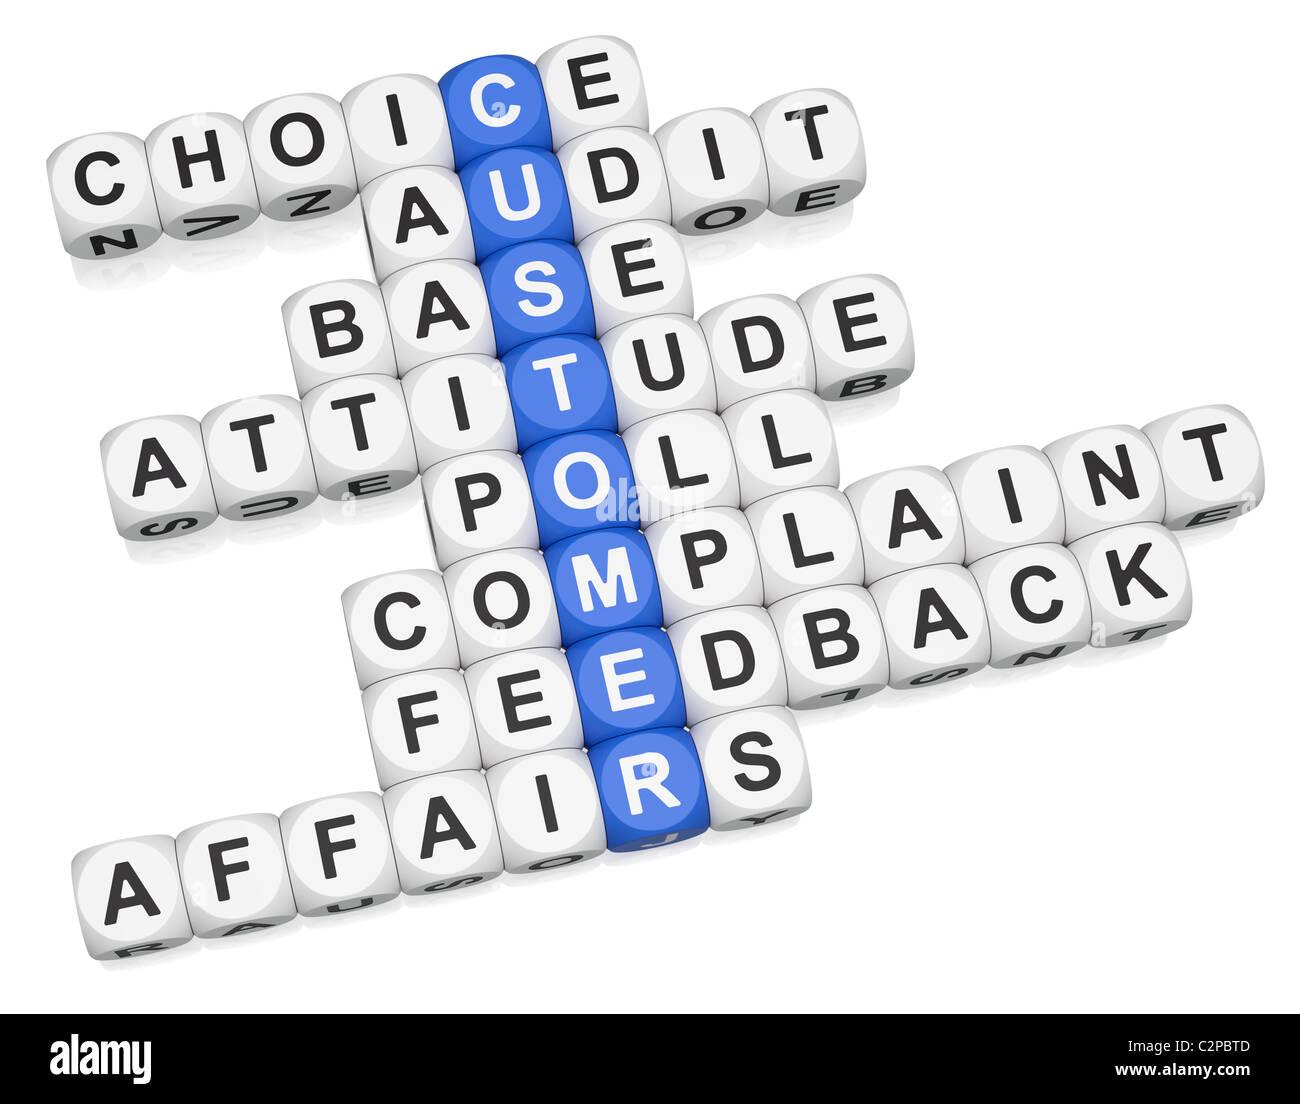 Customer affairs crossword on white background - Stock Image